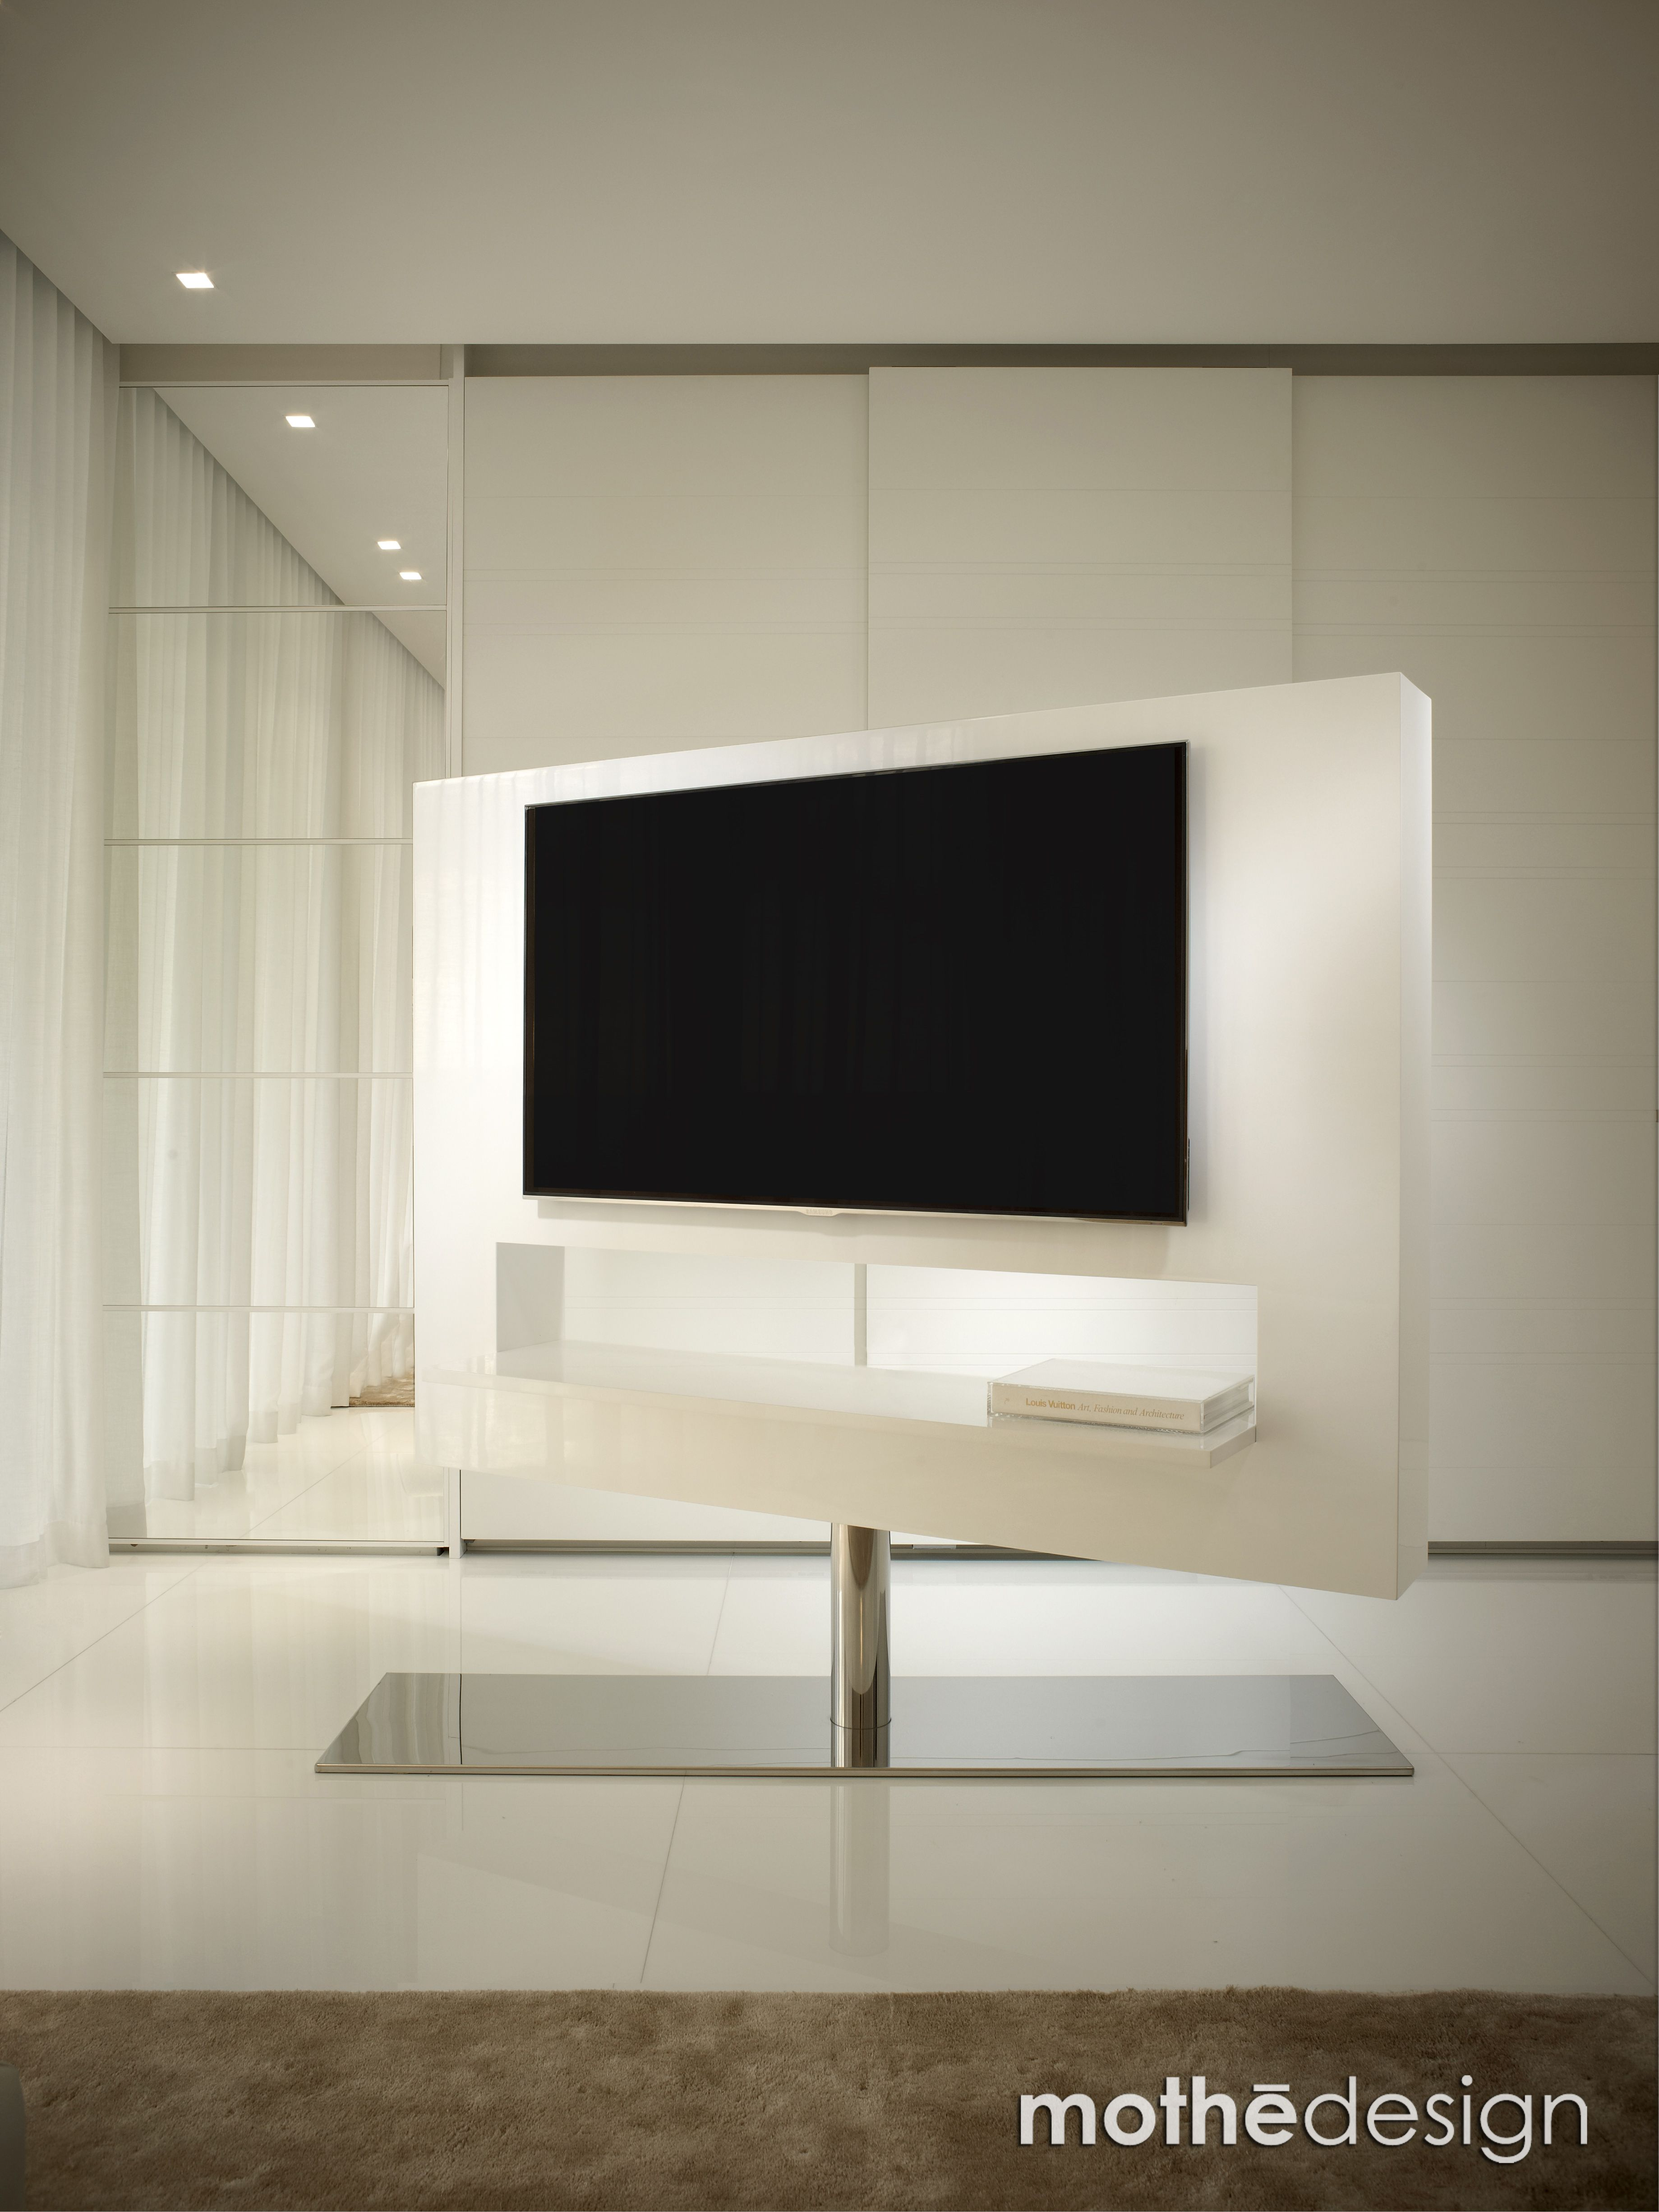 Meuble Tv Angle Suspendu Épinglé par irodon bahadan sur salle de bain | meuble tv